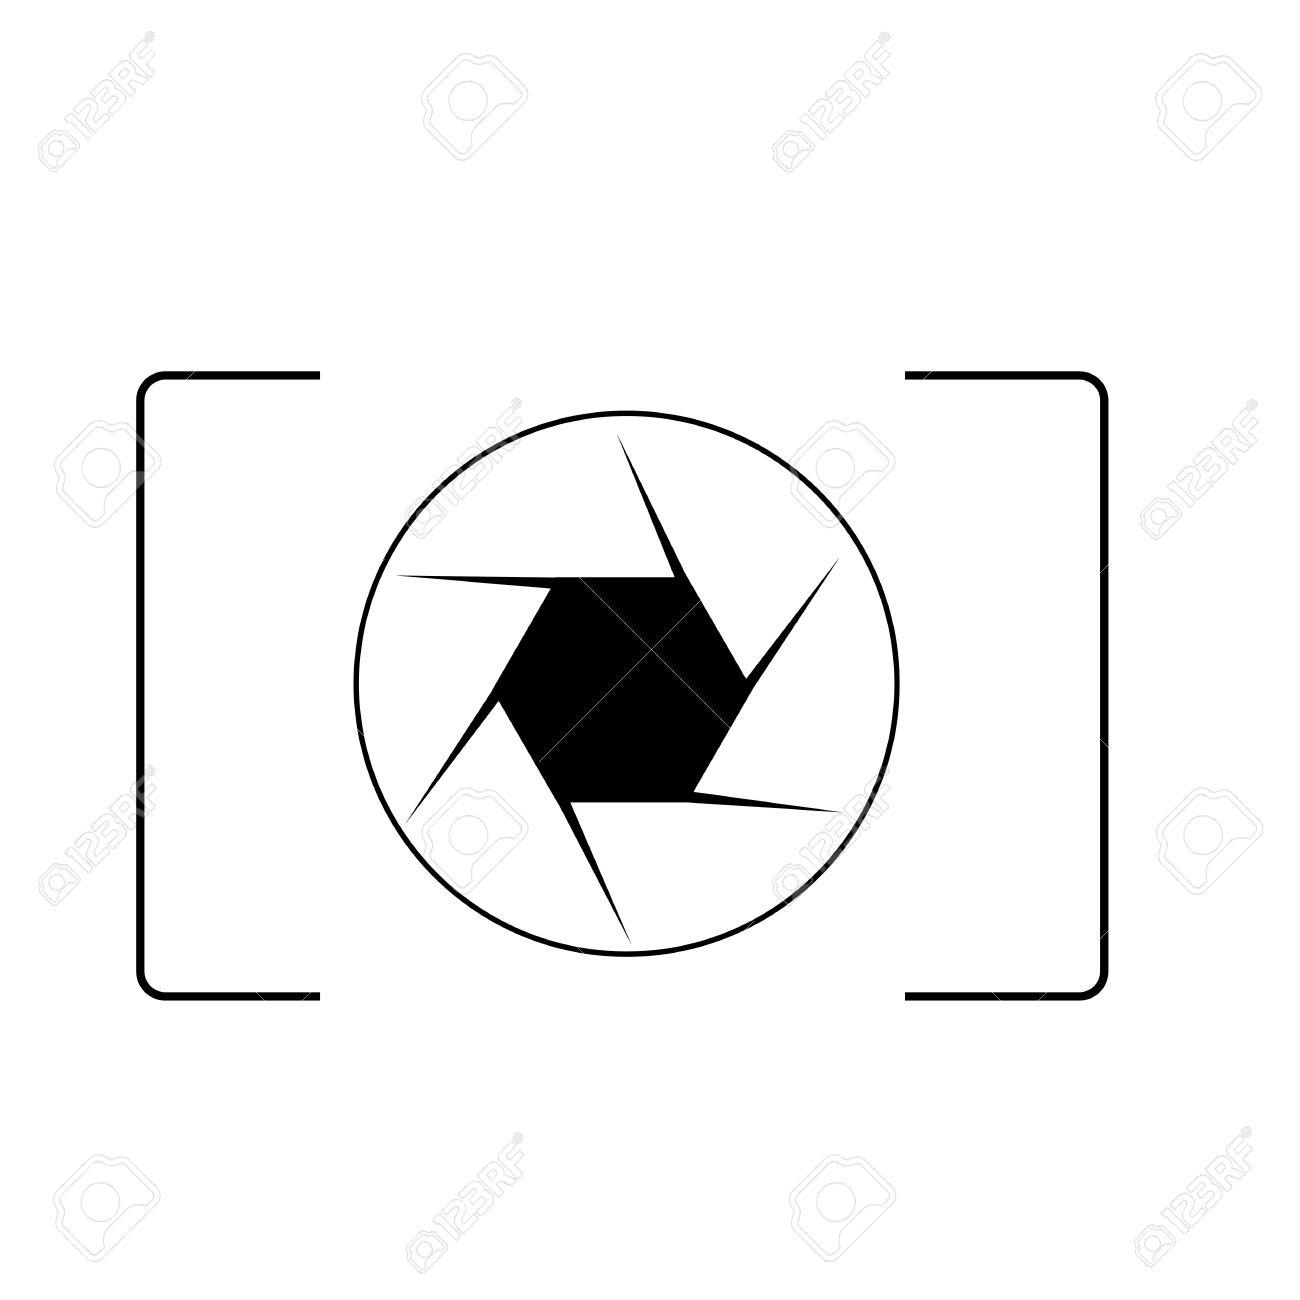 27433 Logo free clipart.